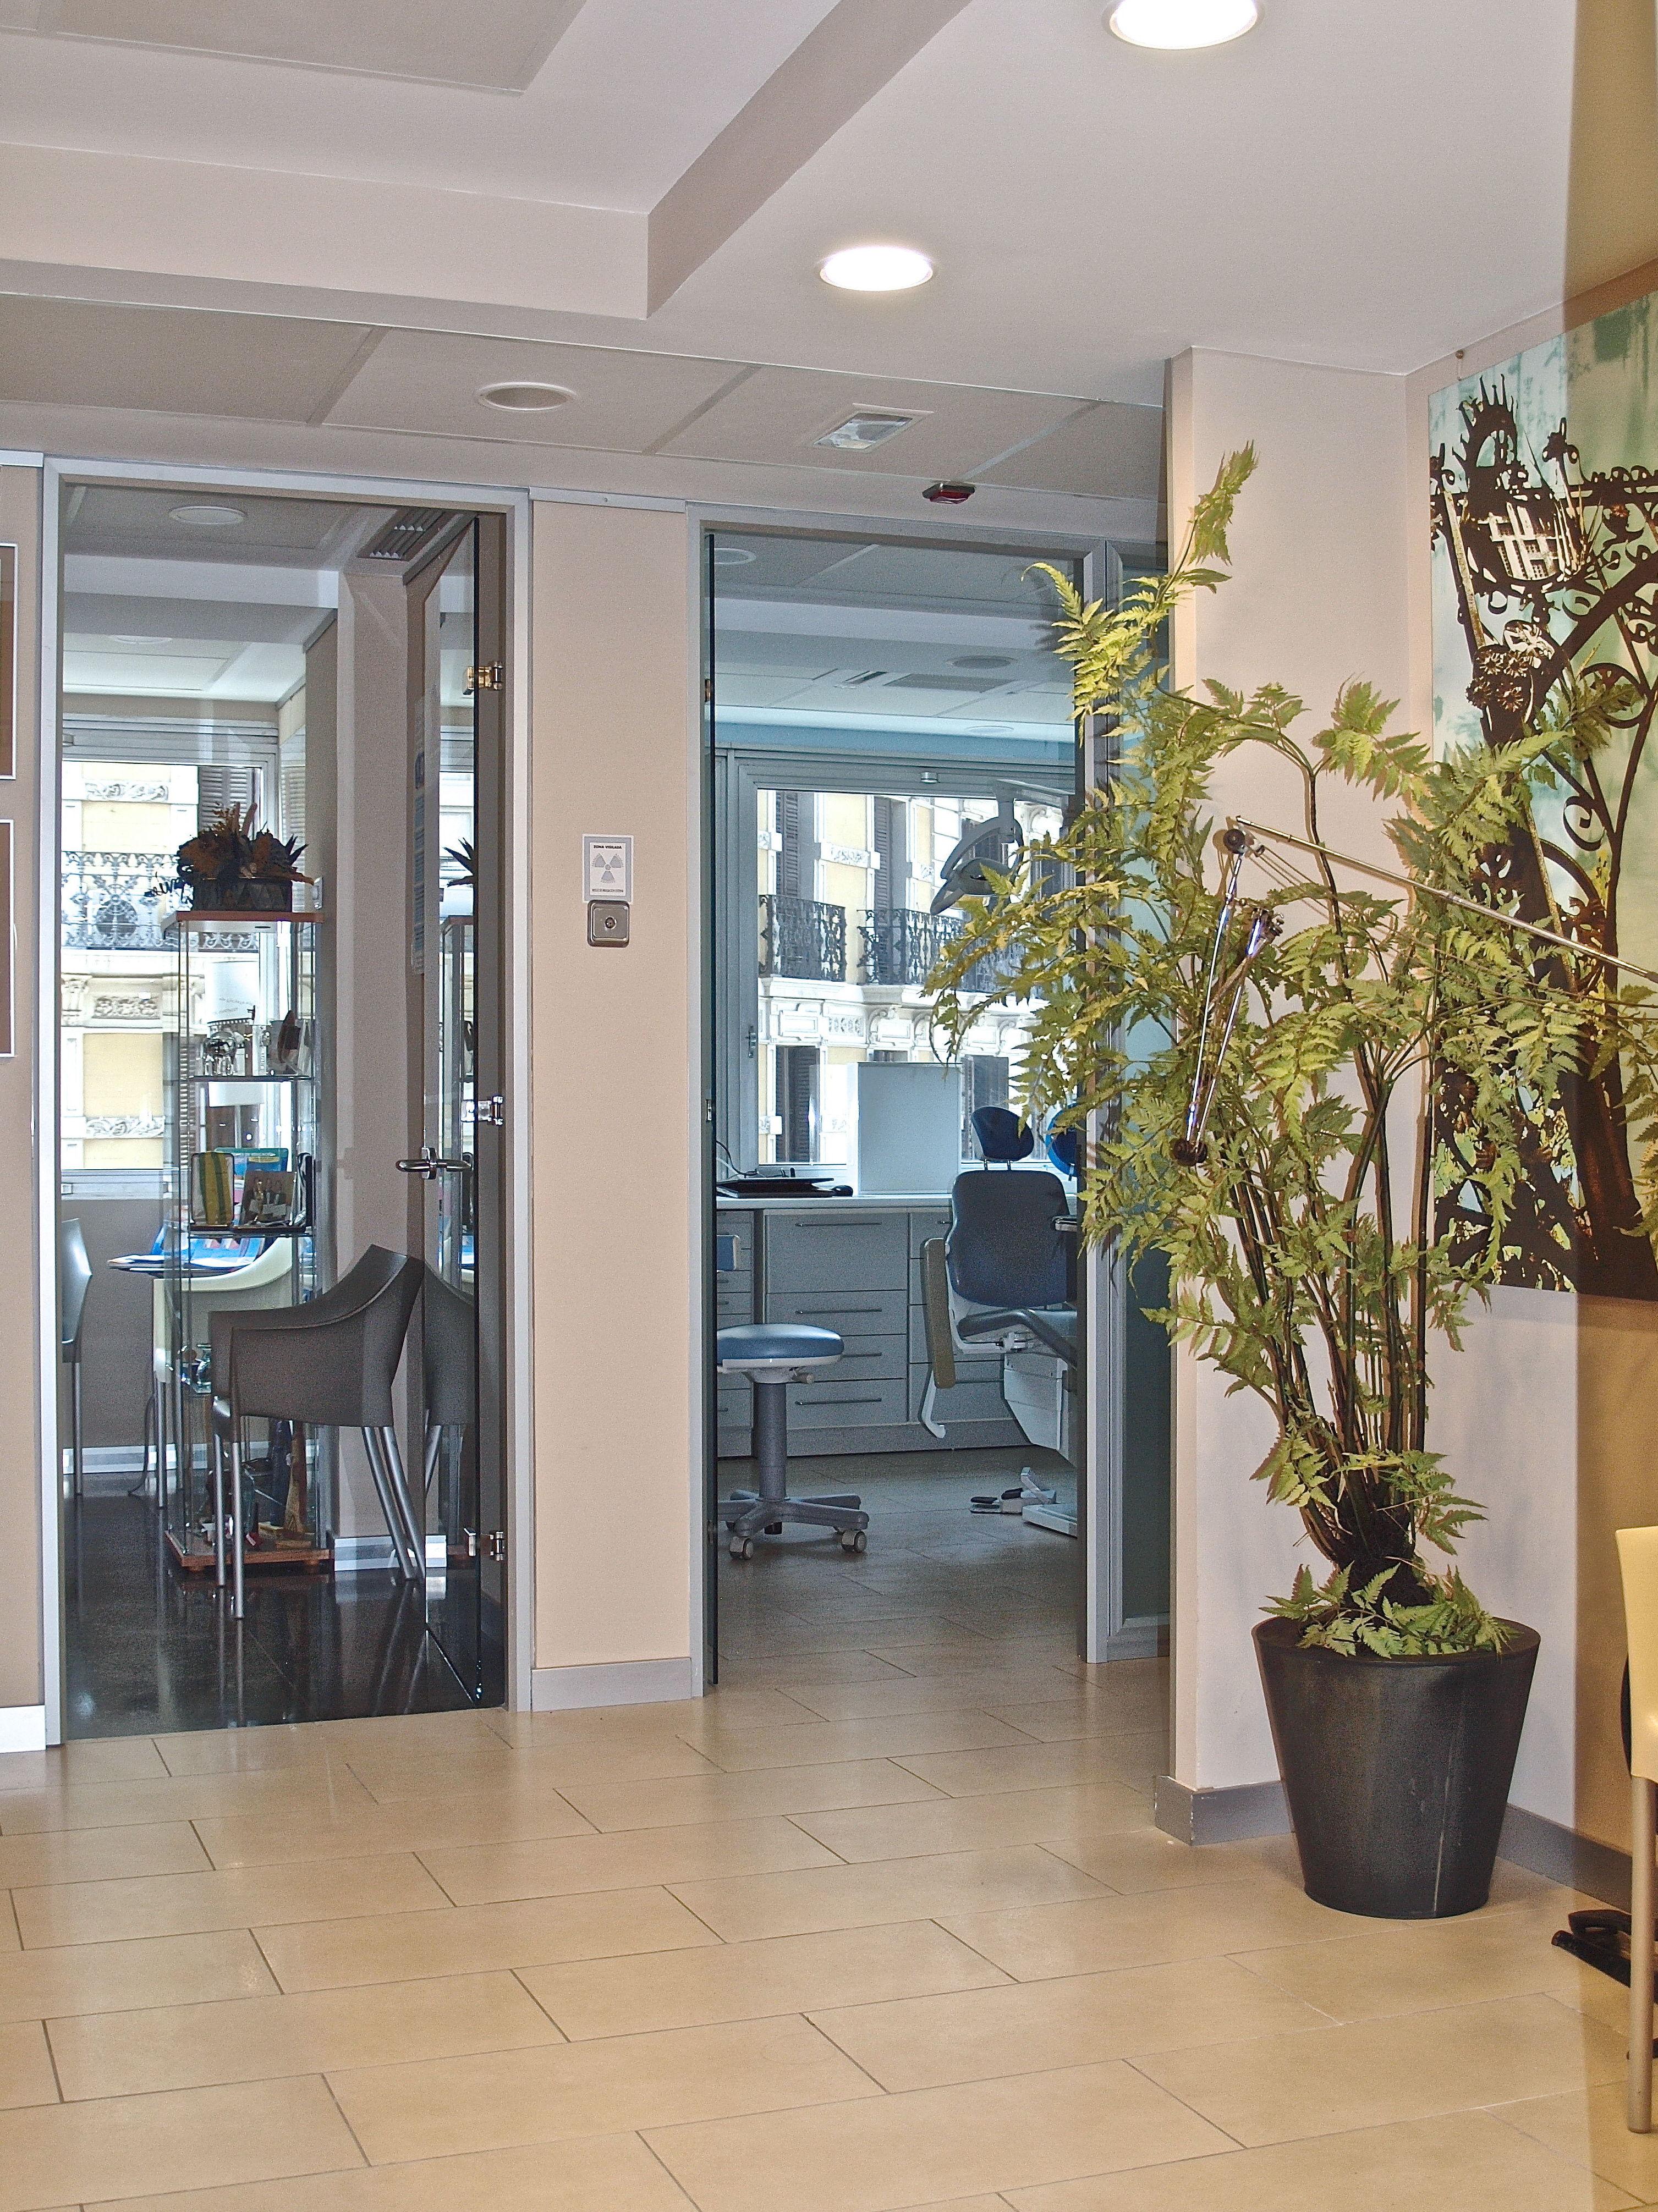 Foto 3 de Clínica dental en Barcelona en Barcelona | IOIB